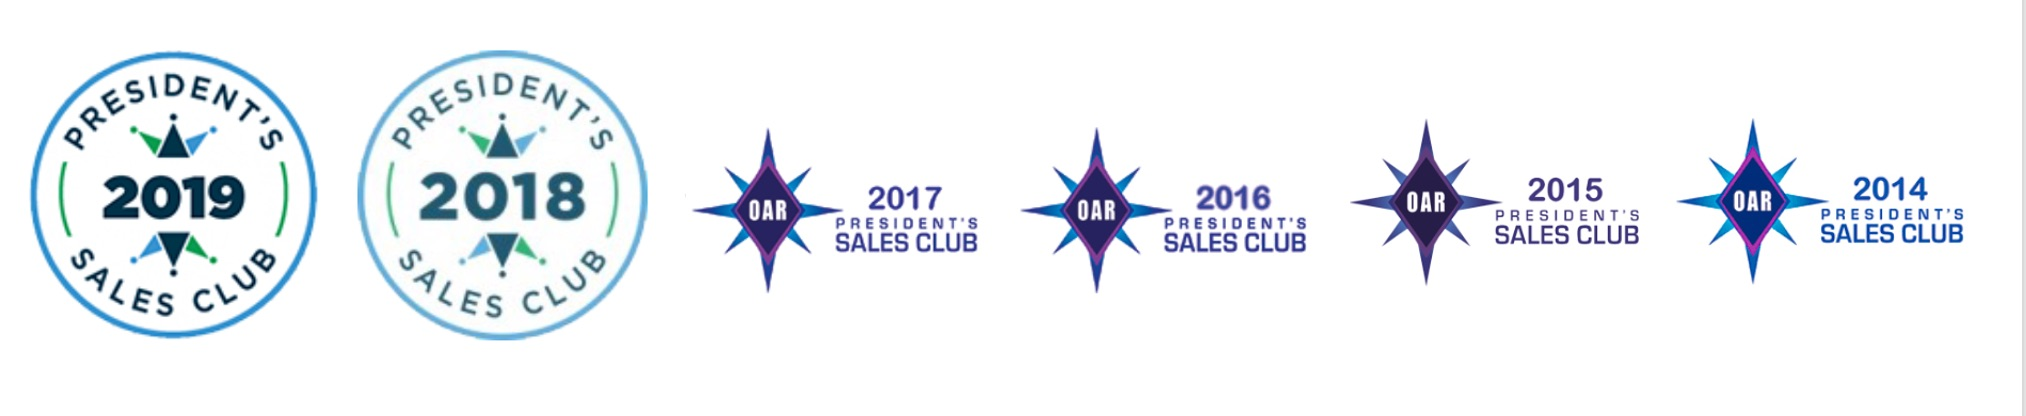 Presidents Sales Club